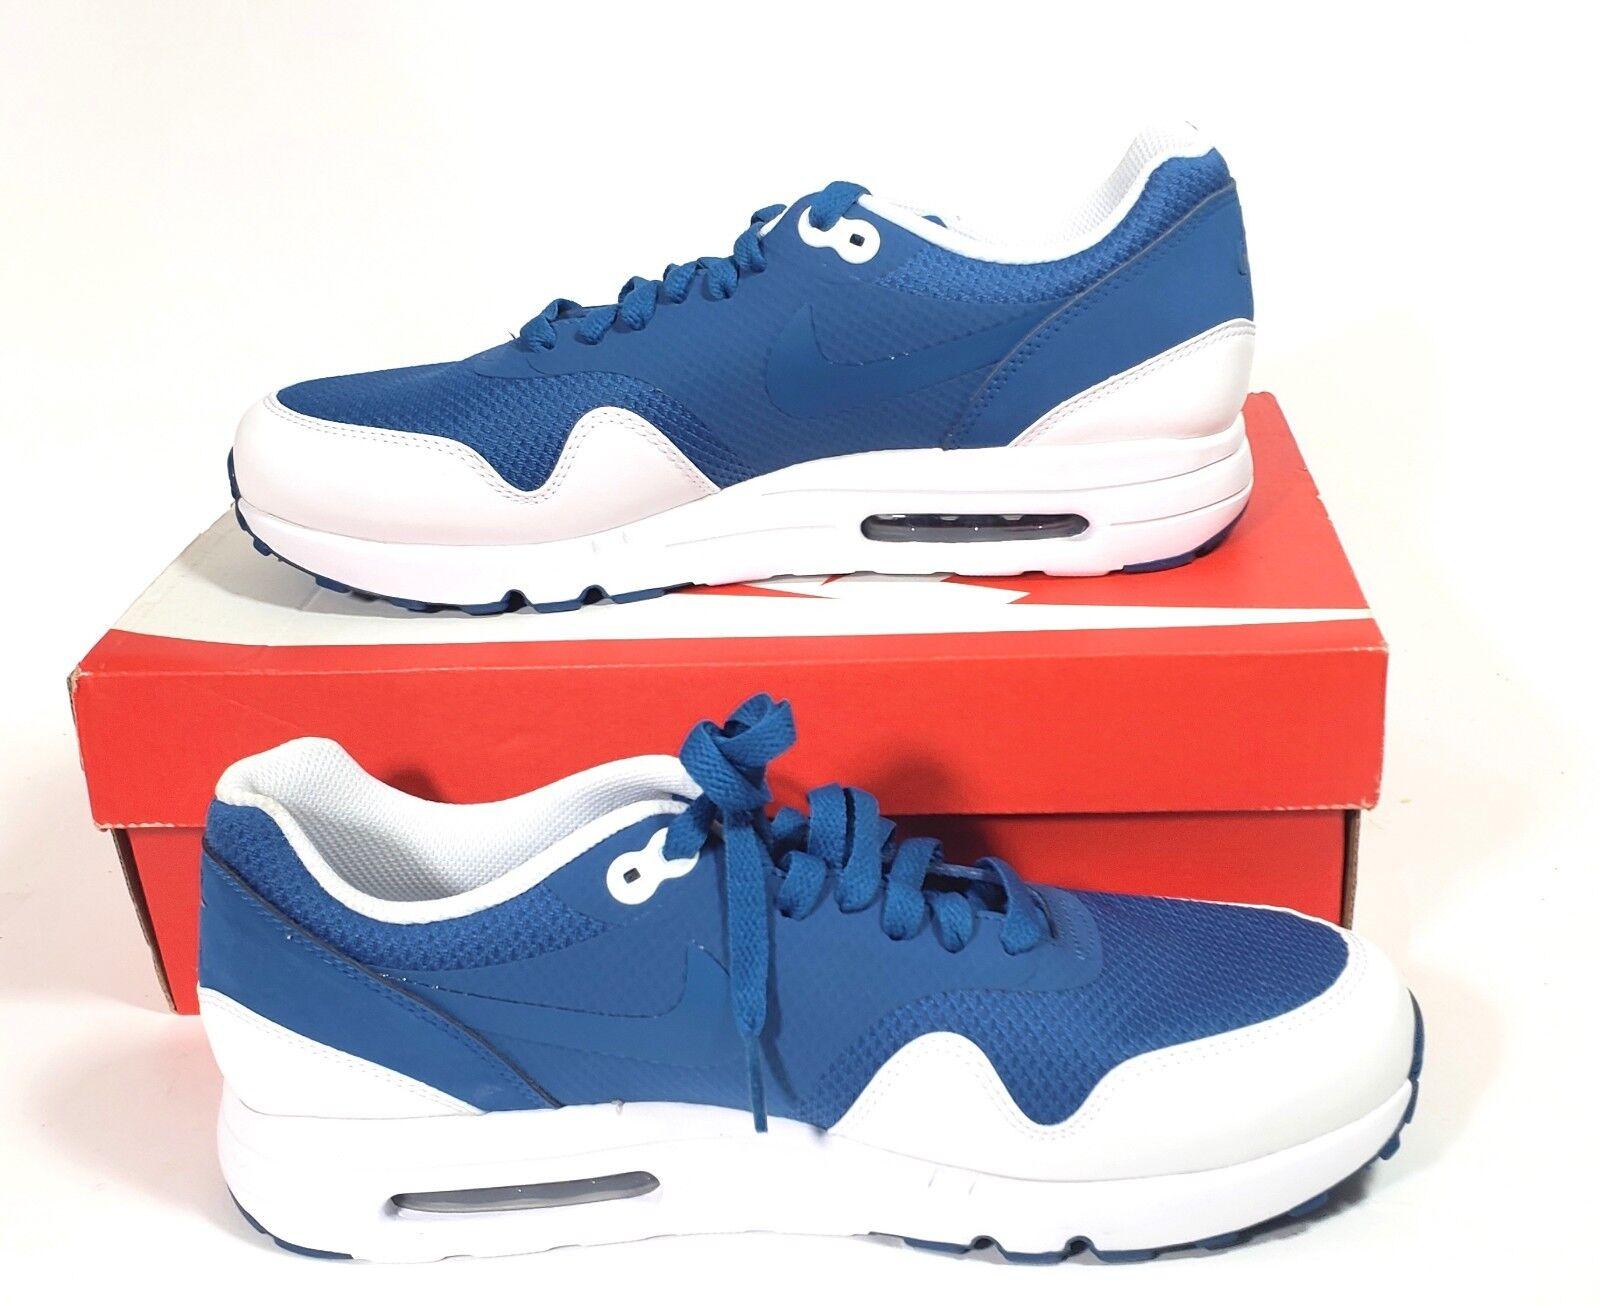 Nike Men's Size 9 Air Max 1 Ultra 2.0 Essential 875679-402 Industrial blueee